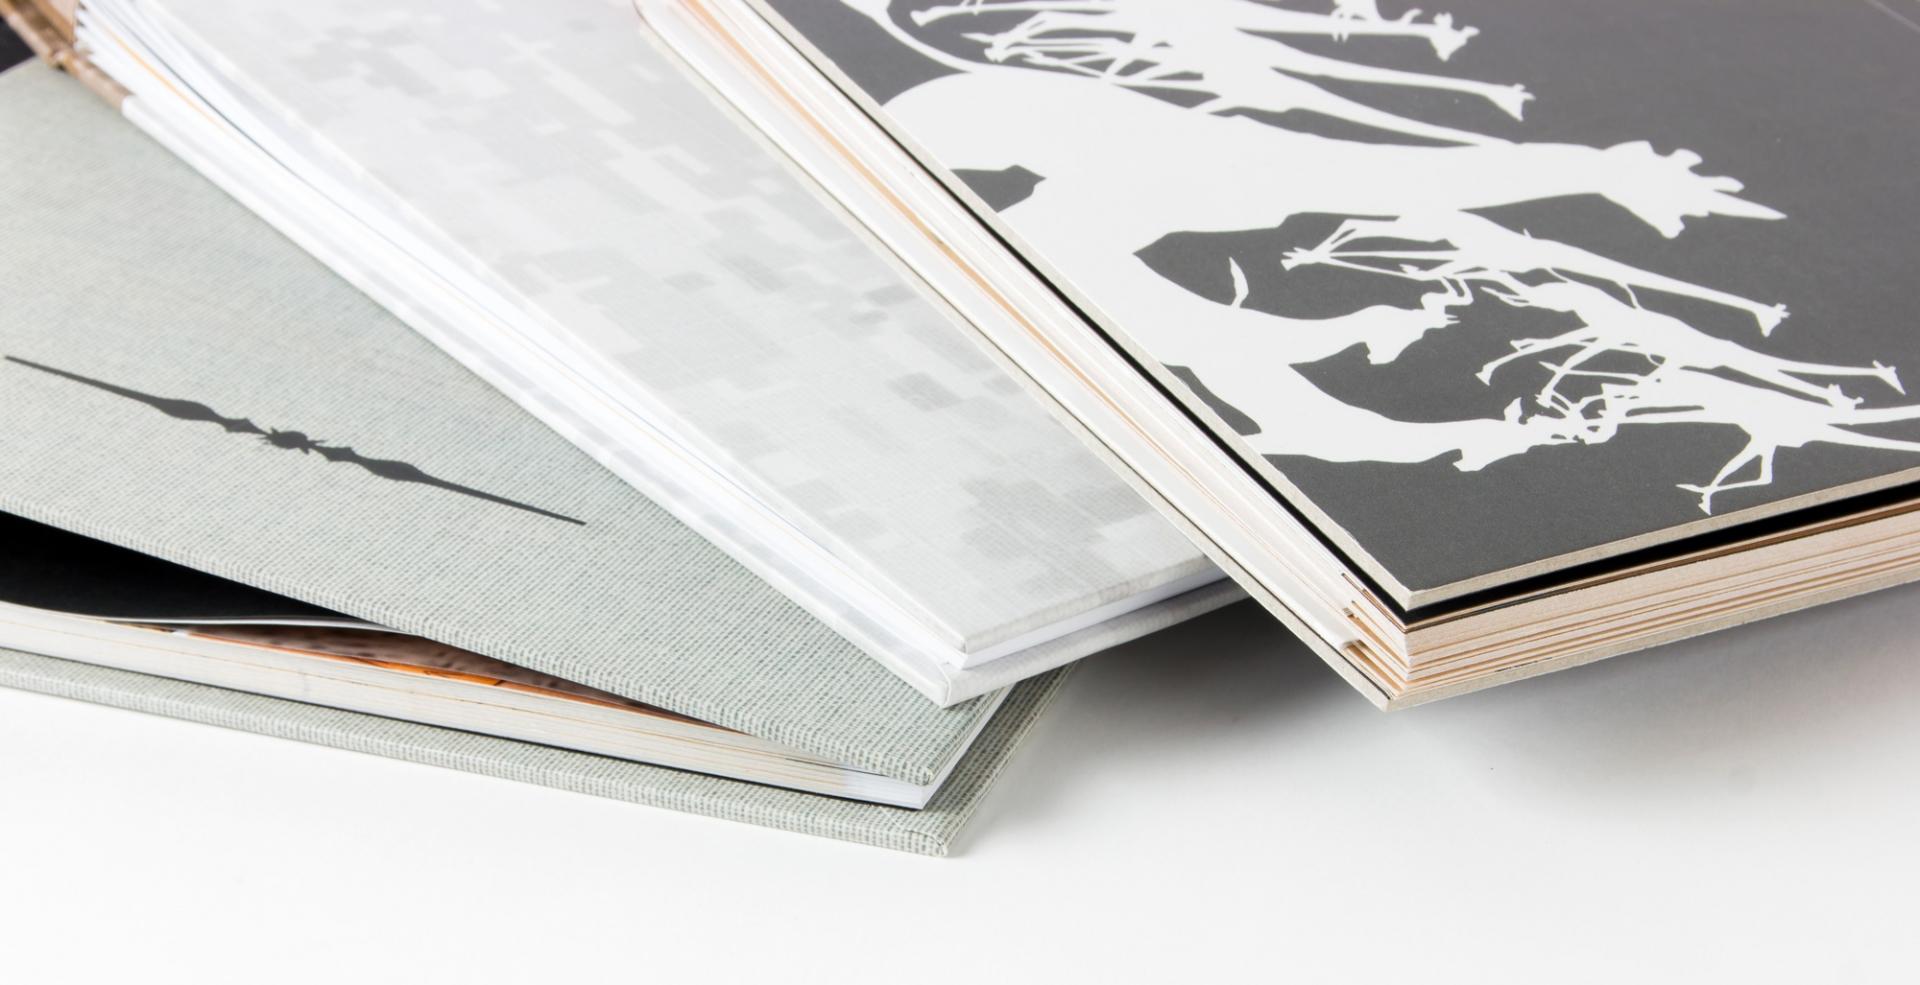 Campionario Tessuti | Woolrich - Centroffset stampa, packaging, grafica